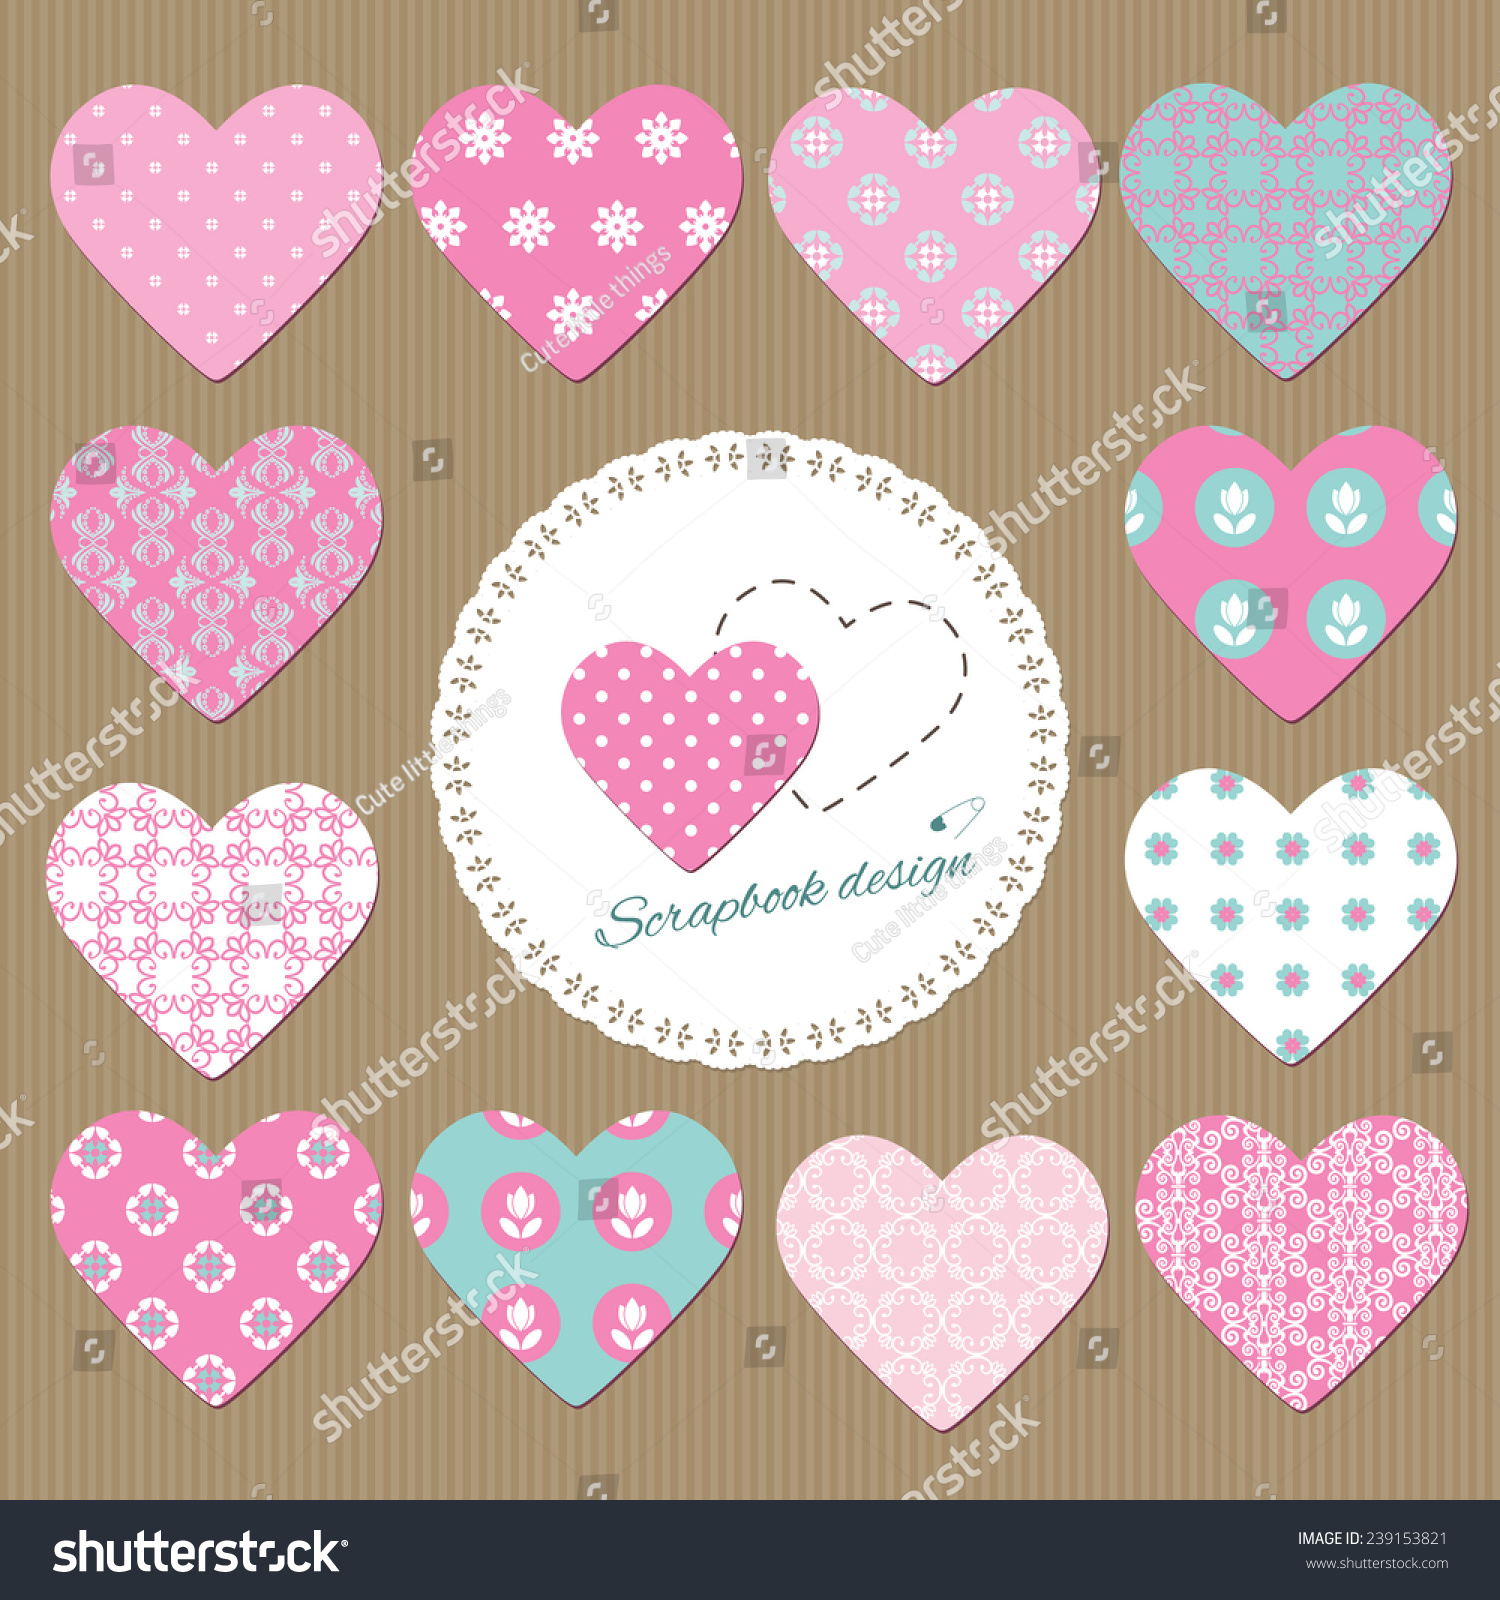 Hearts Set Scrapbook Design Elements Different Stock Vector Royalty